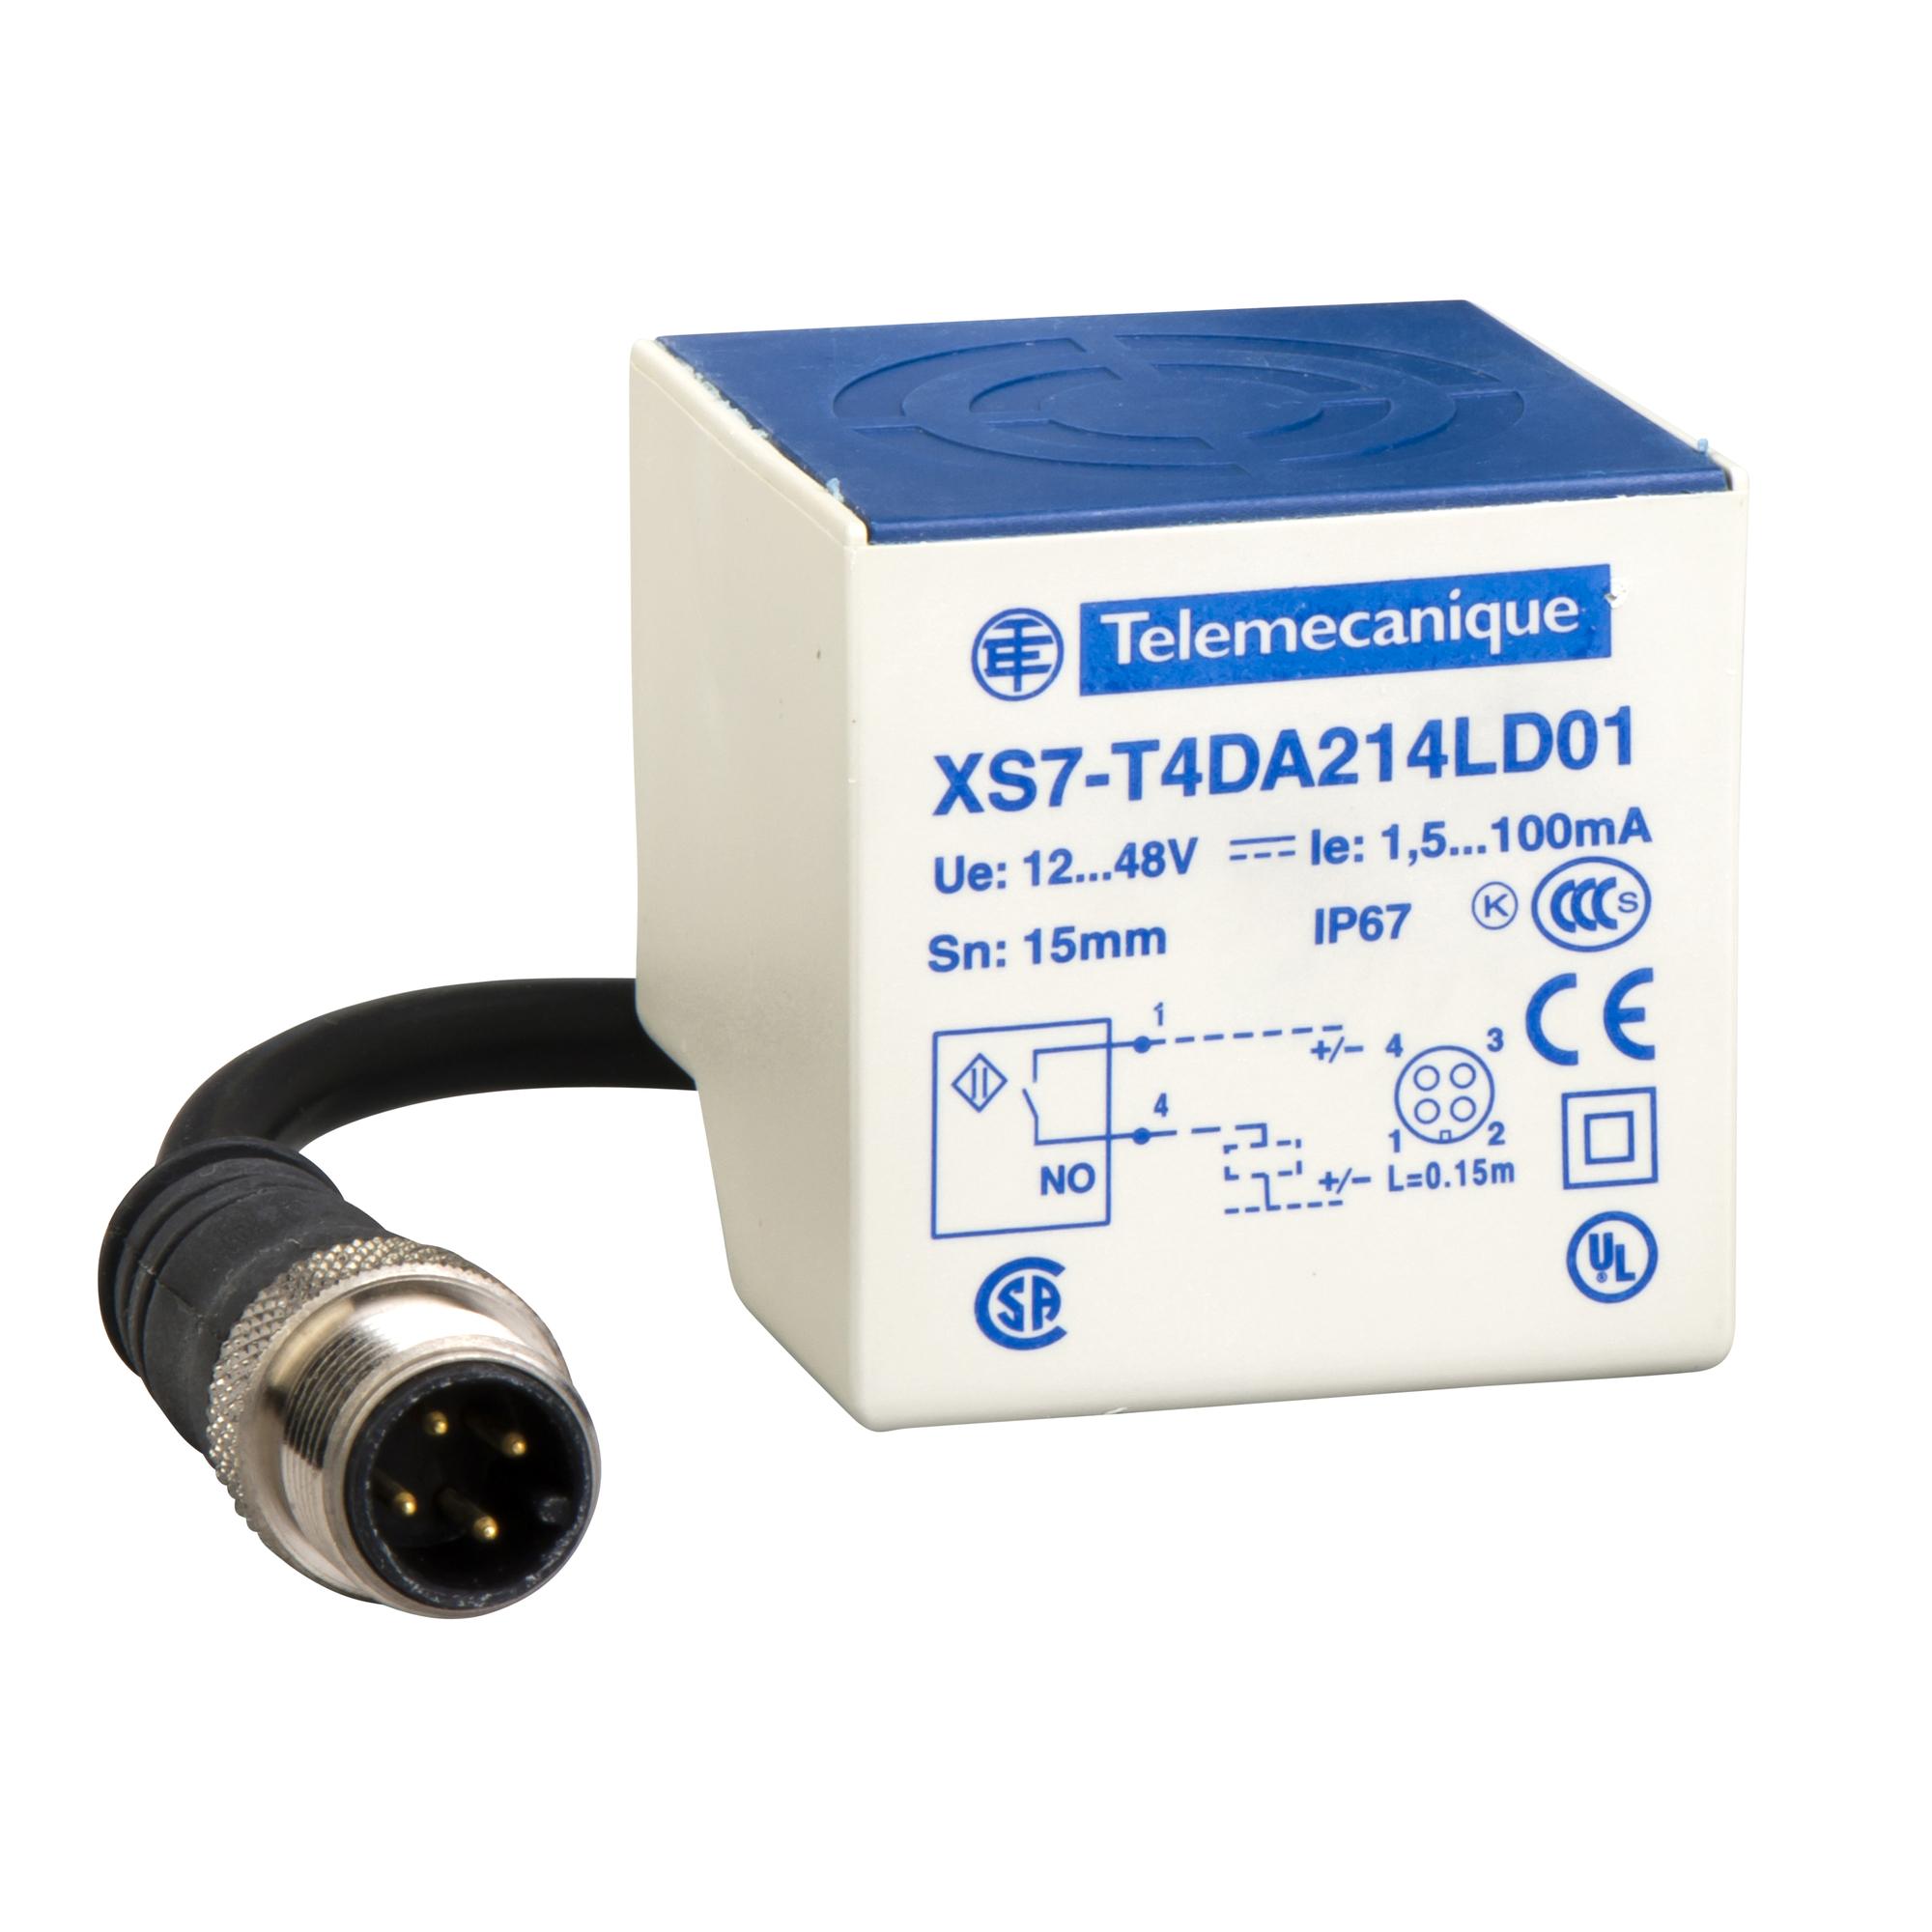 Image Description for https://tedi.itc-electronics.com/itcmedia/images/20190425/XS7C4A1MPG13TF_SCHNEIDERELECTRIC_1.jpeg